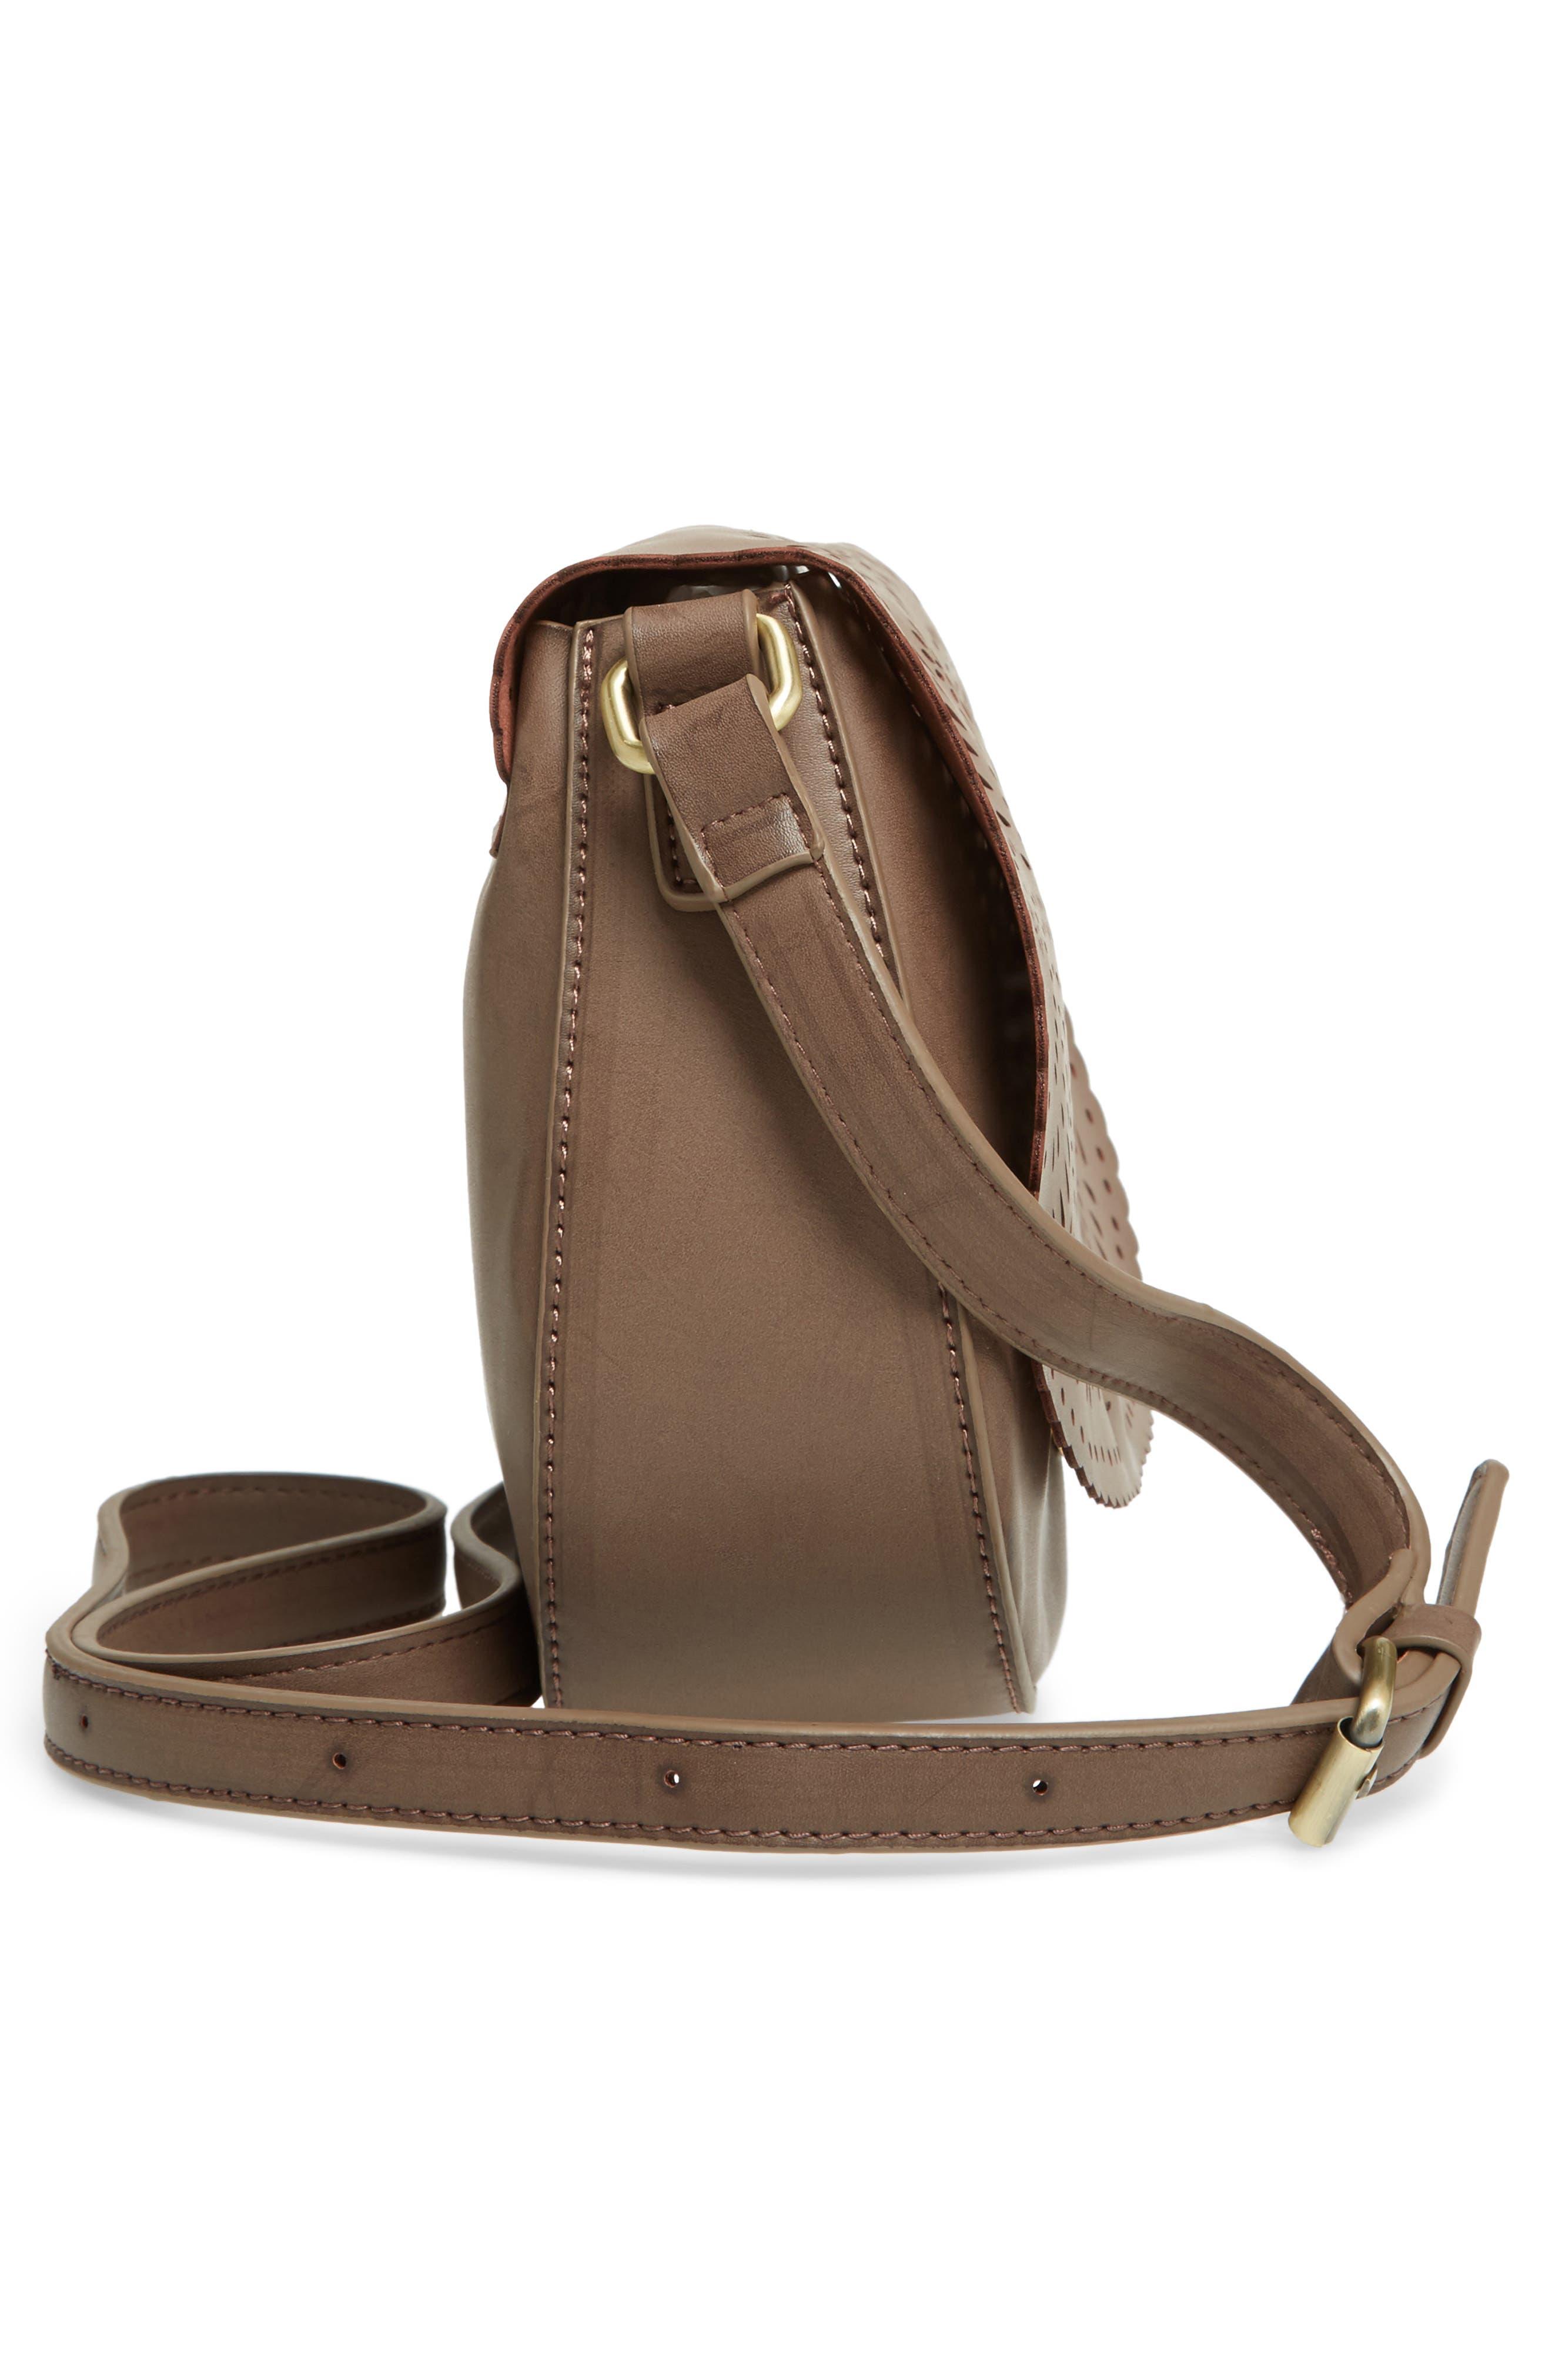 Dakota Faux Leather Saddle Bag,                             Alternate thumbnail 5, color,                             022